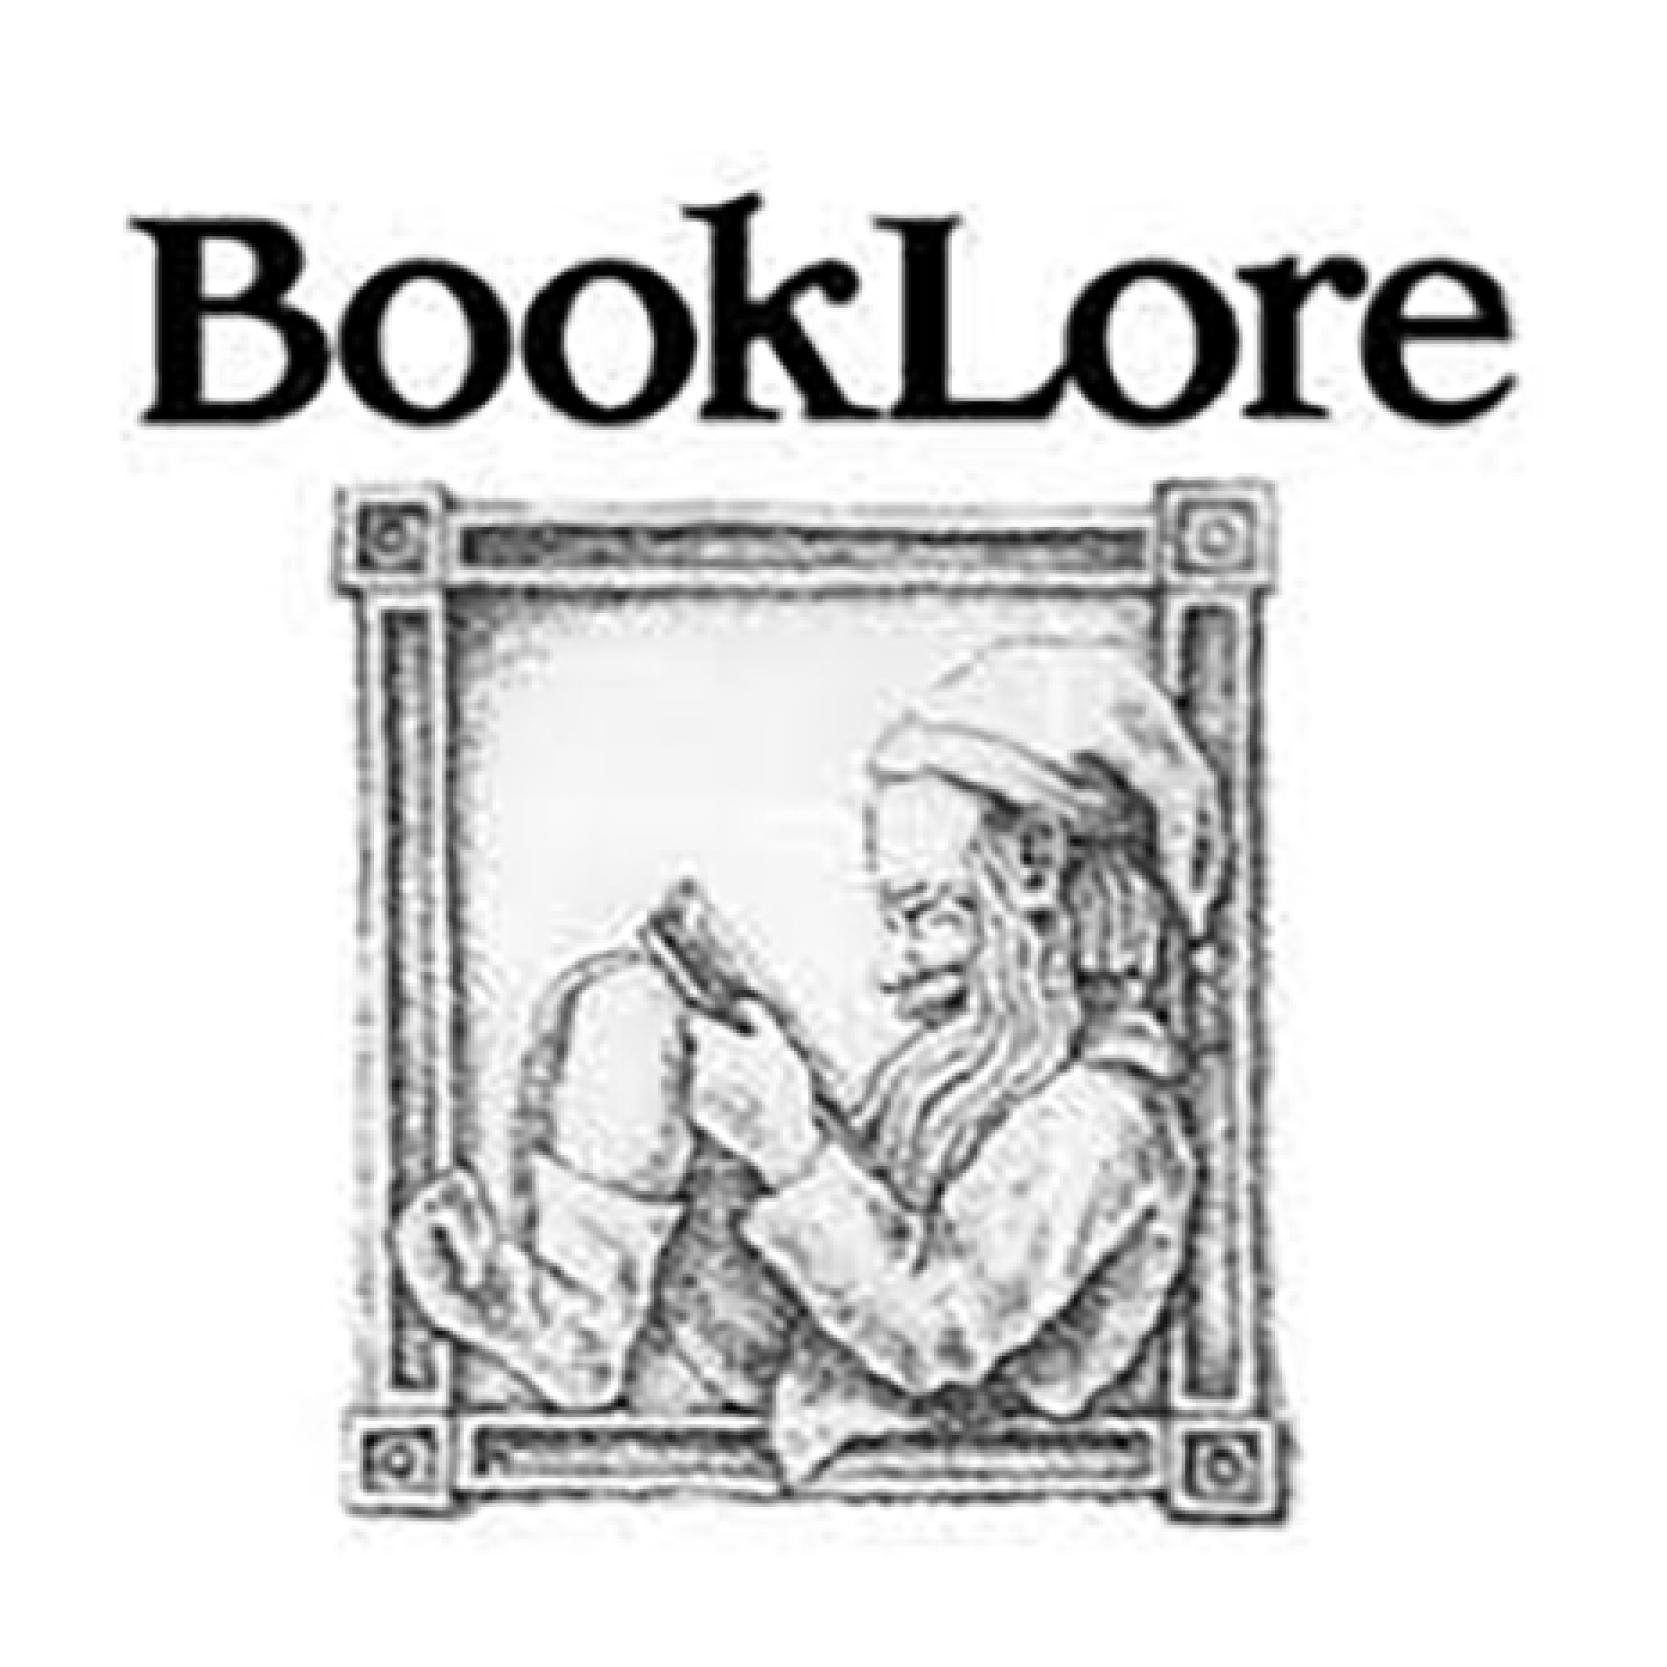 https://booklore.ca/